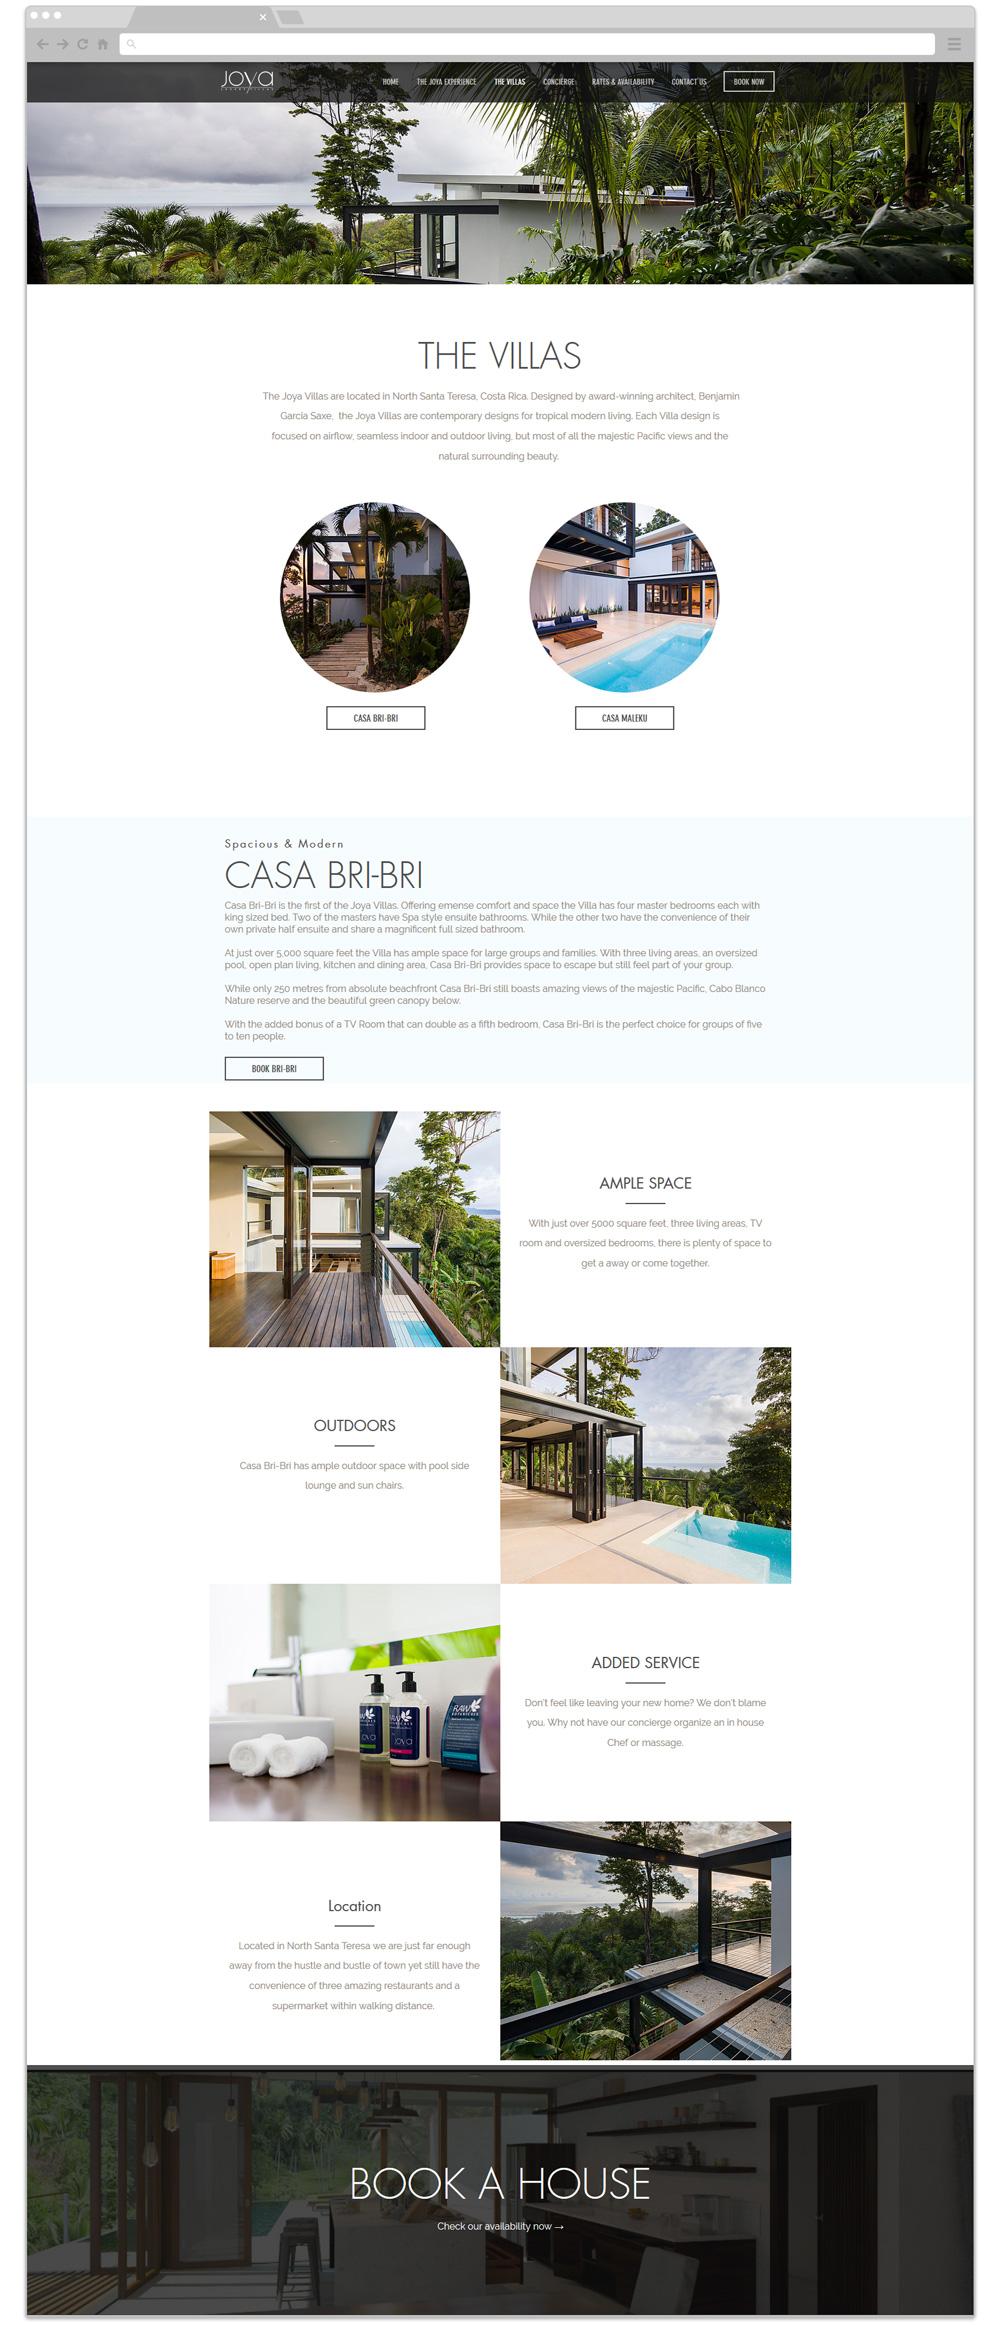 river-stone-creative-co-websites-kc-sales-lab-2